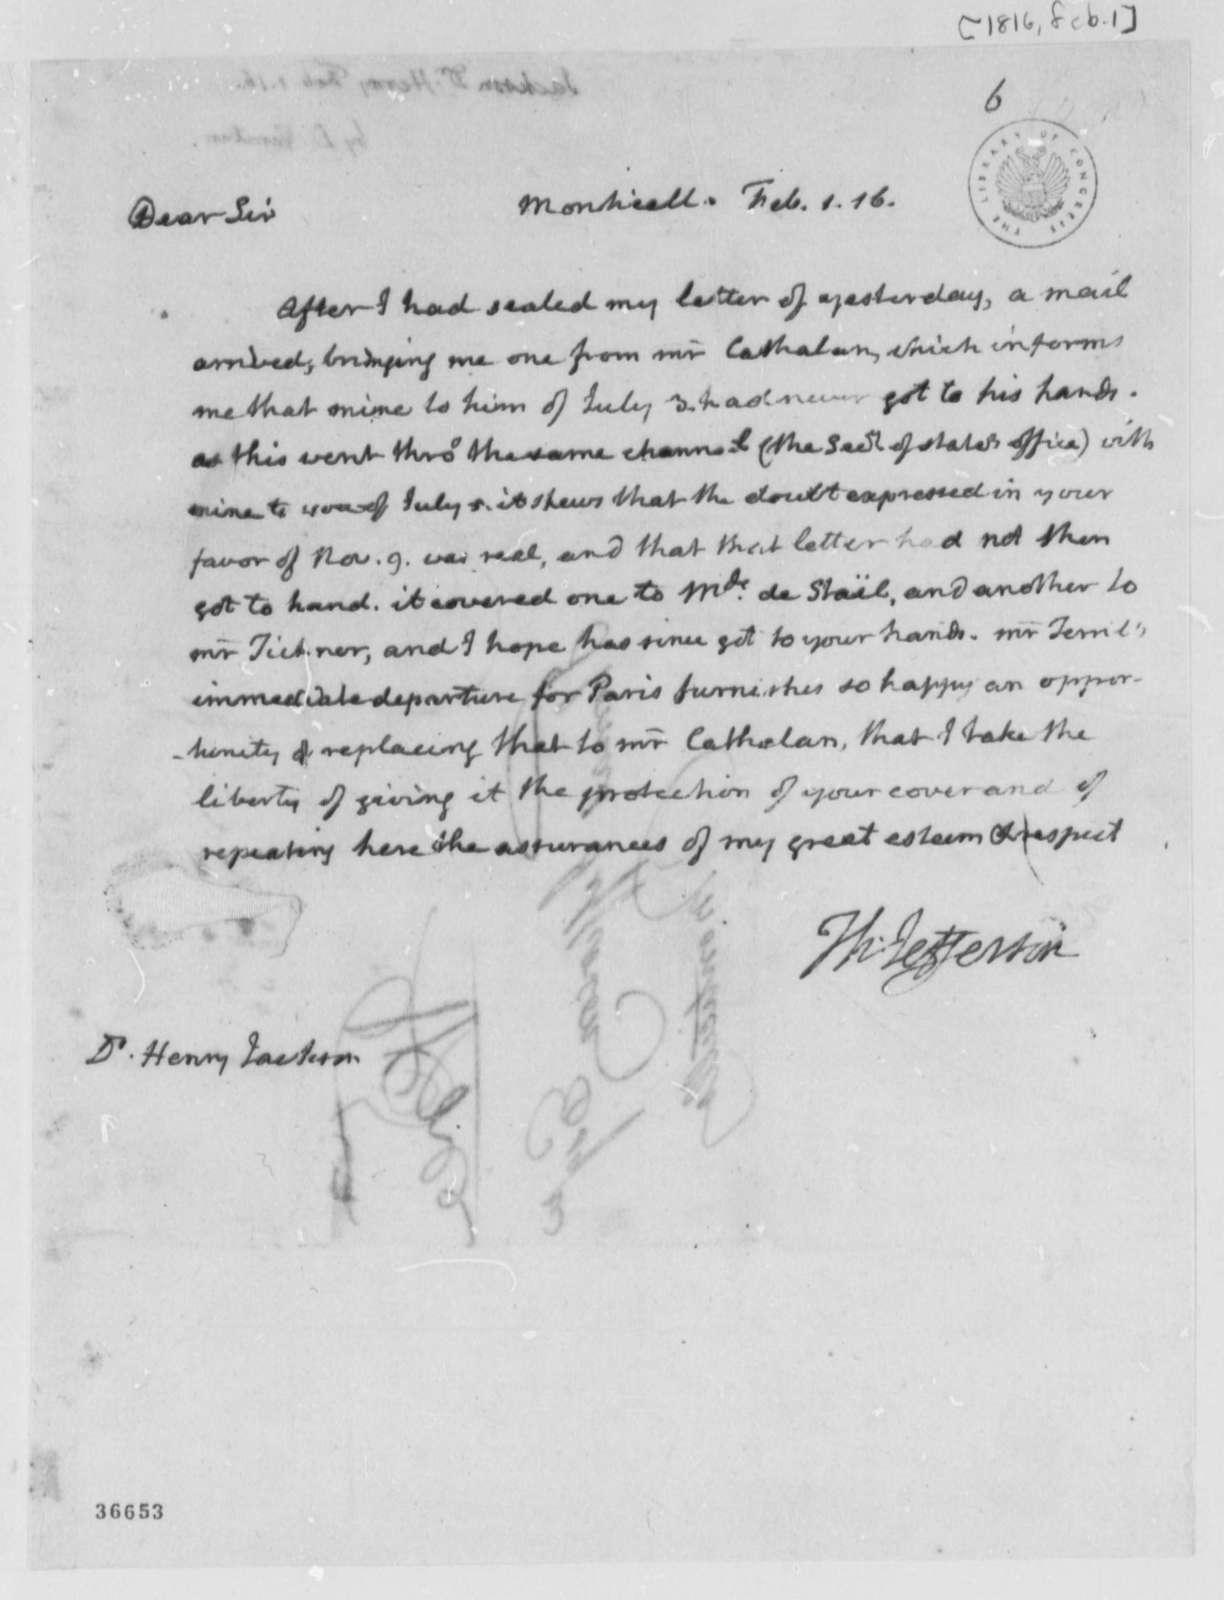 Thomas Jefferson to Henry Jackson, February 1, 1816